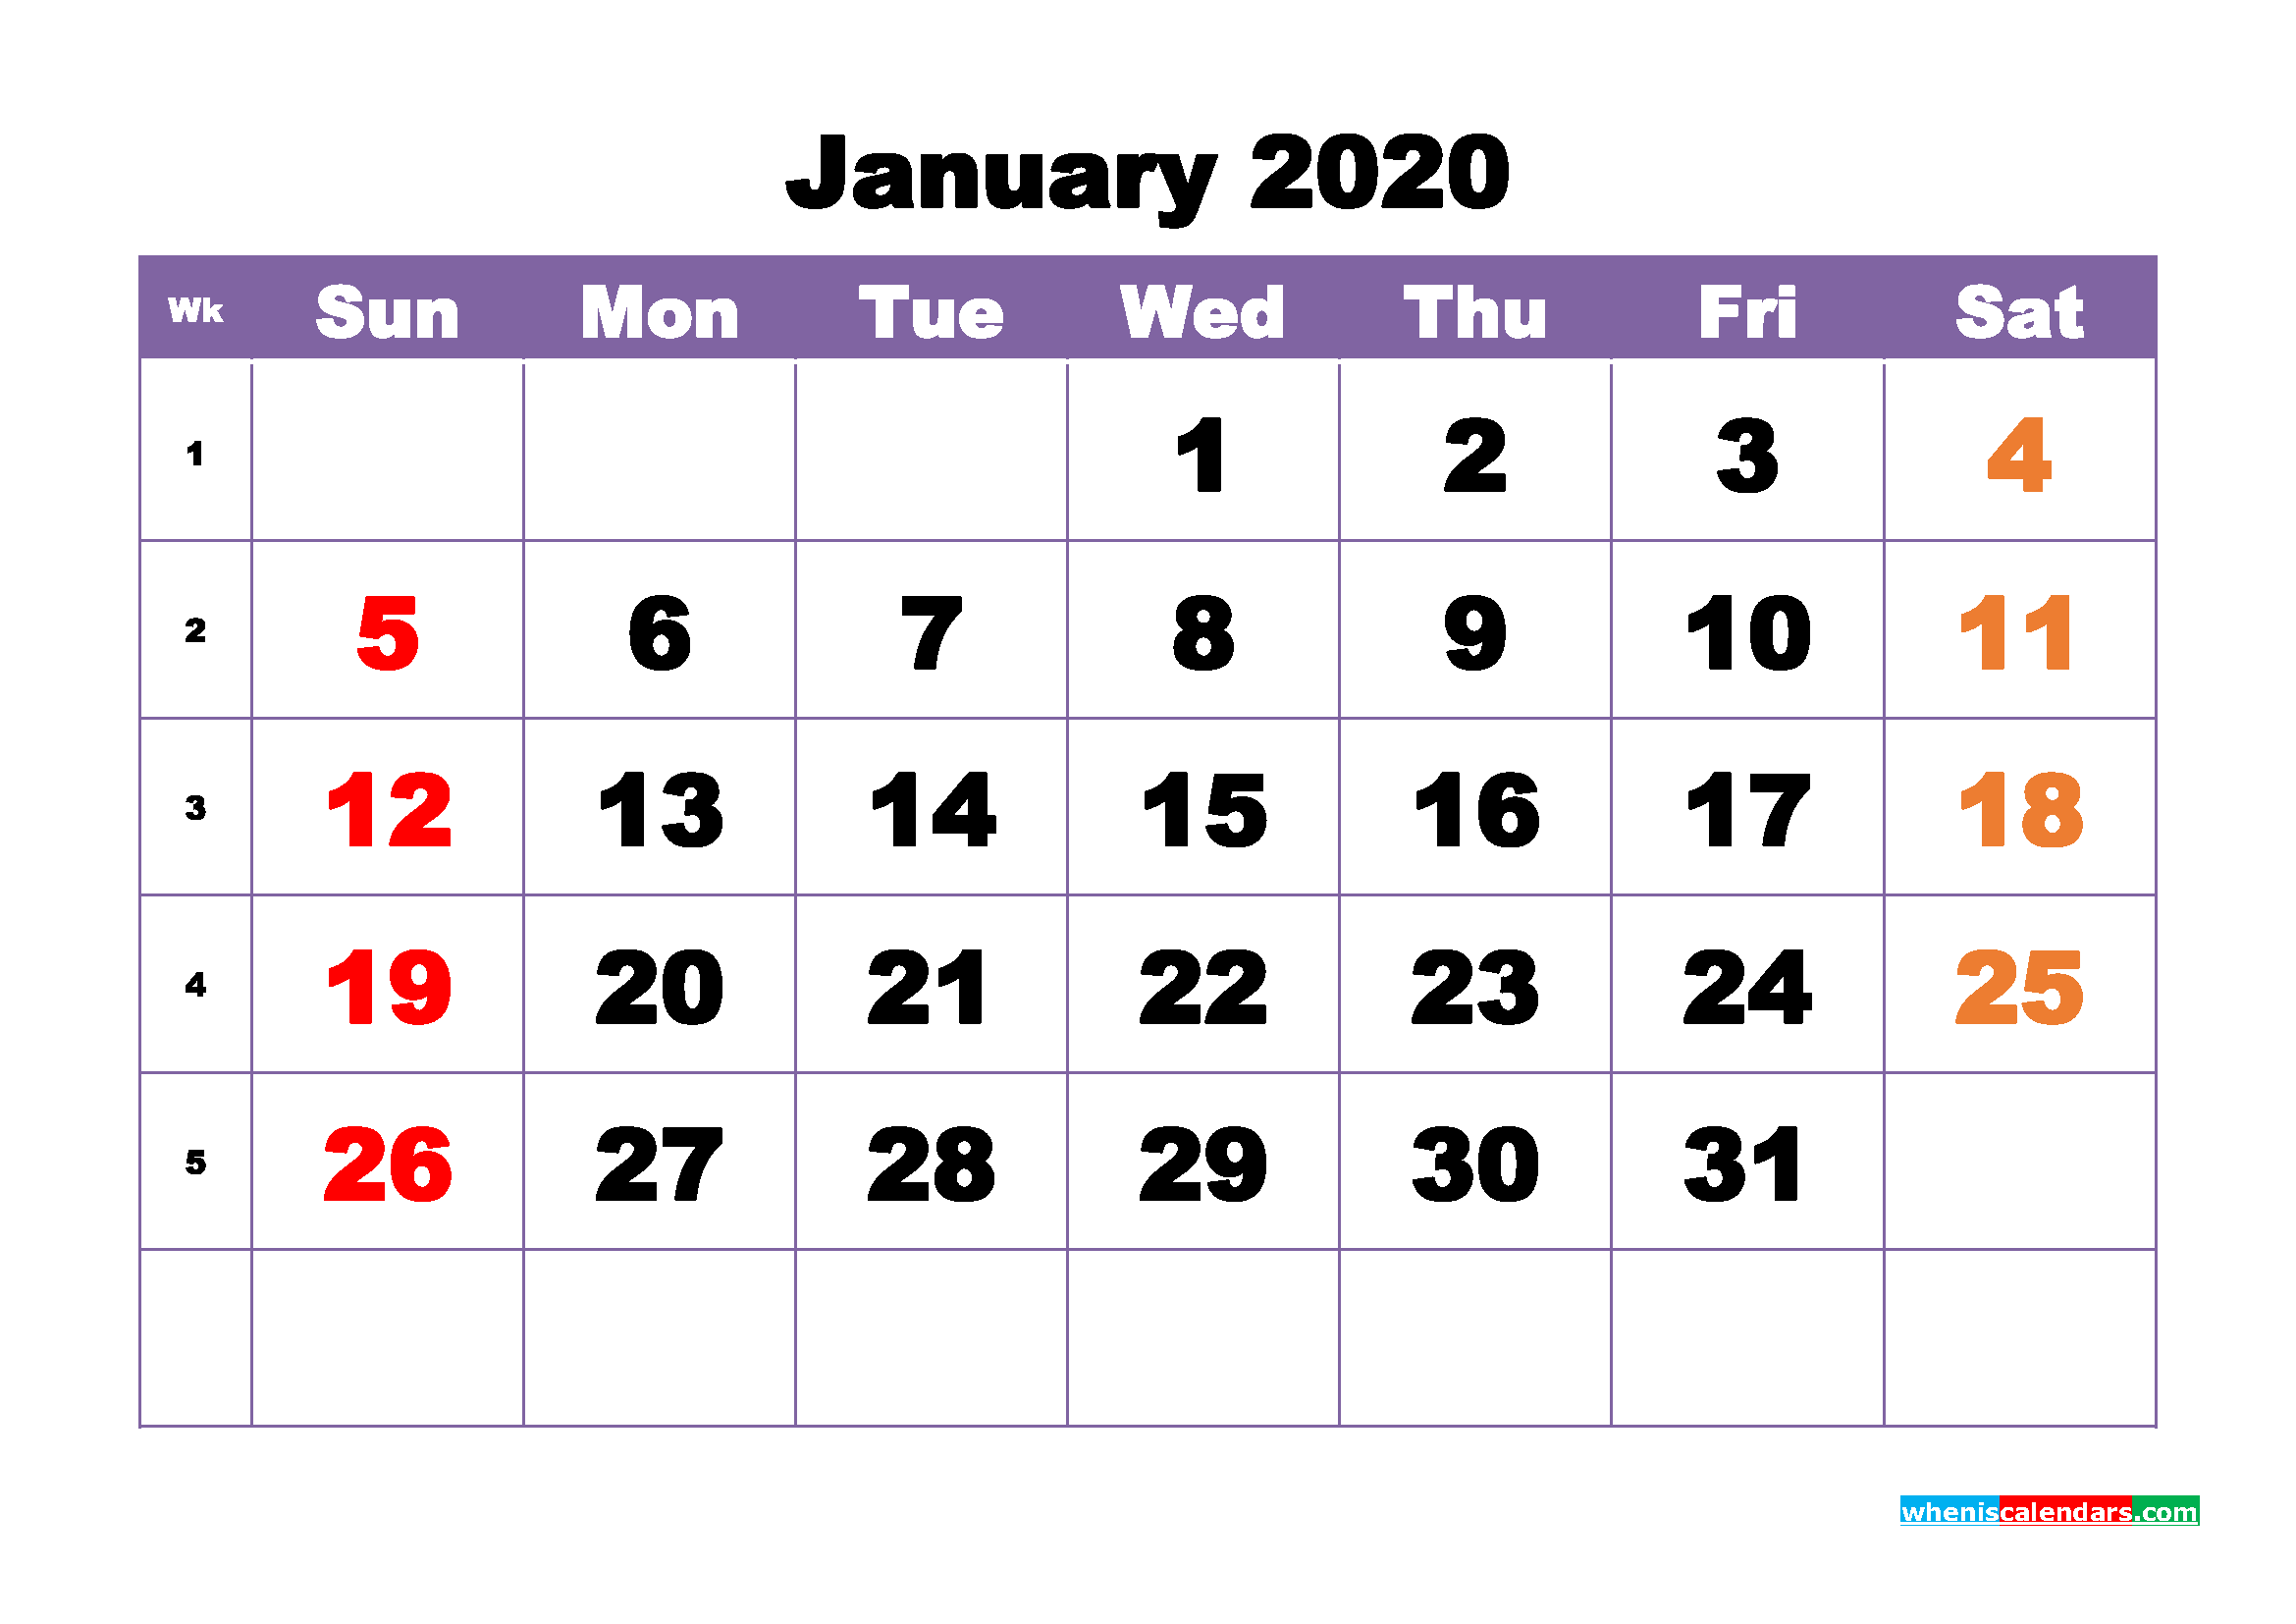 Free Printable January 2020 Calendar - No.m20b385